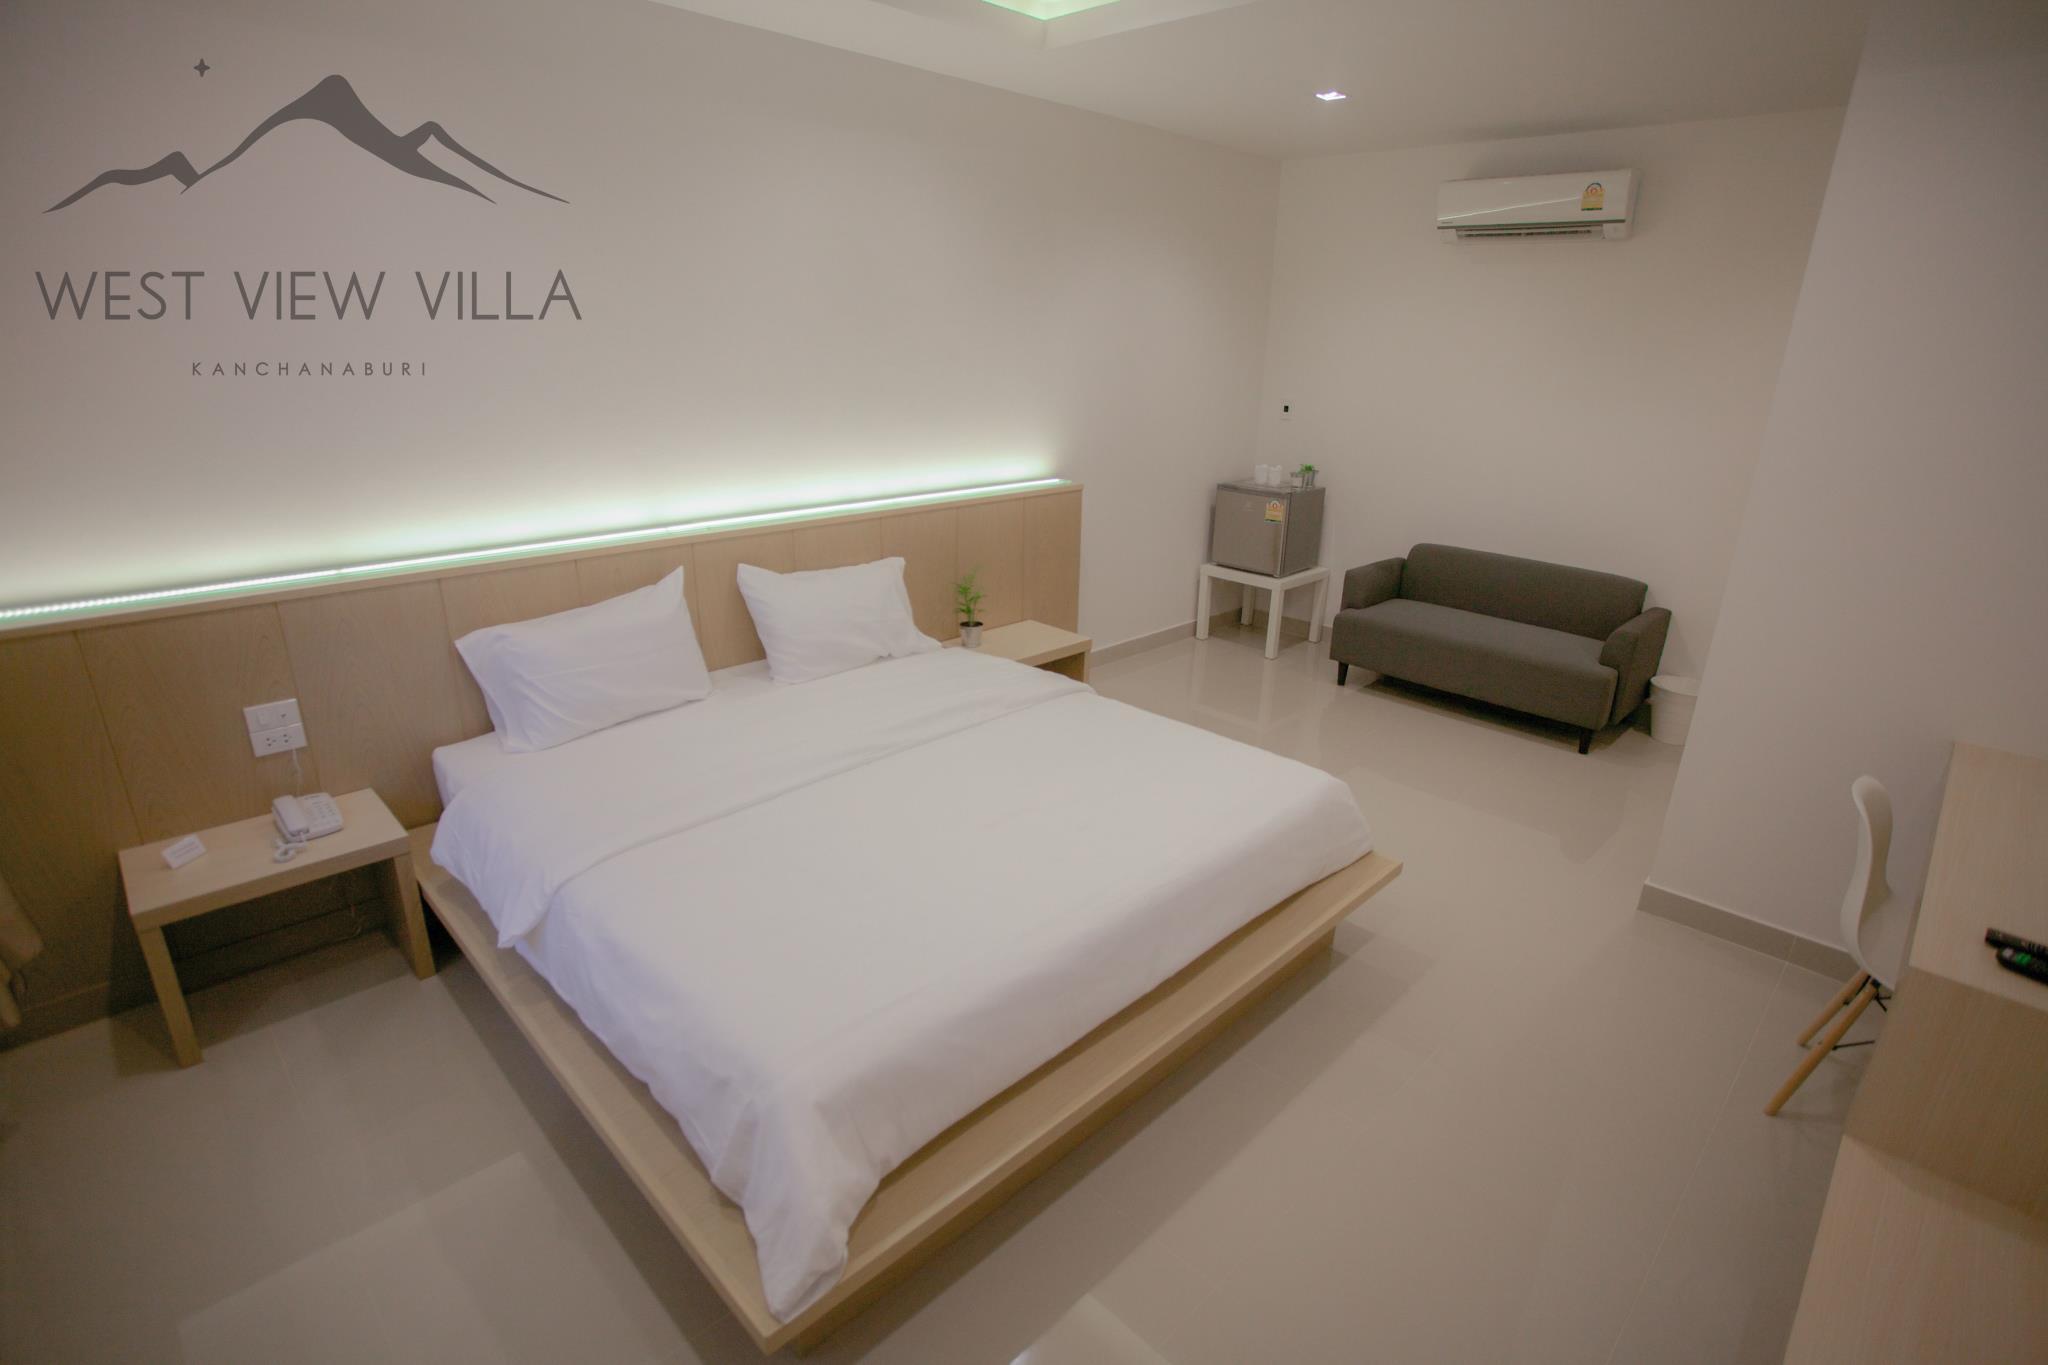 West View Villa